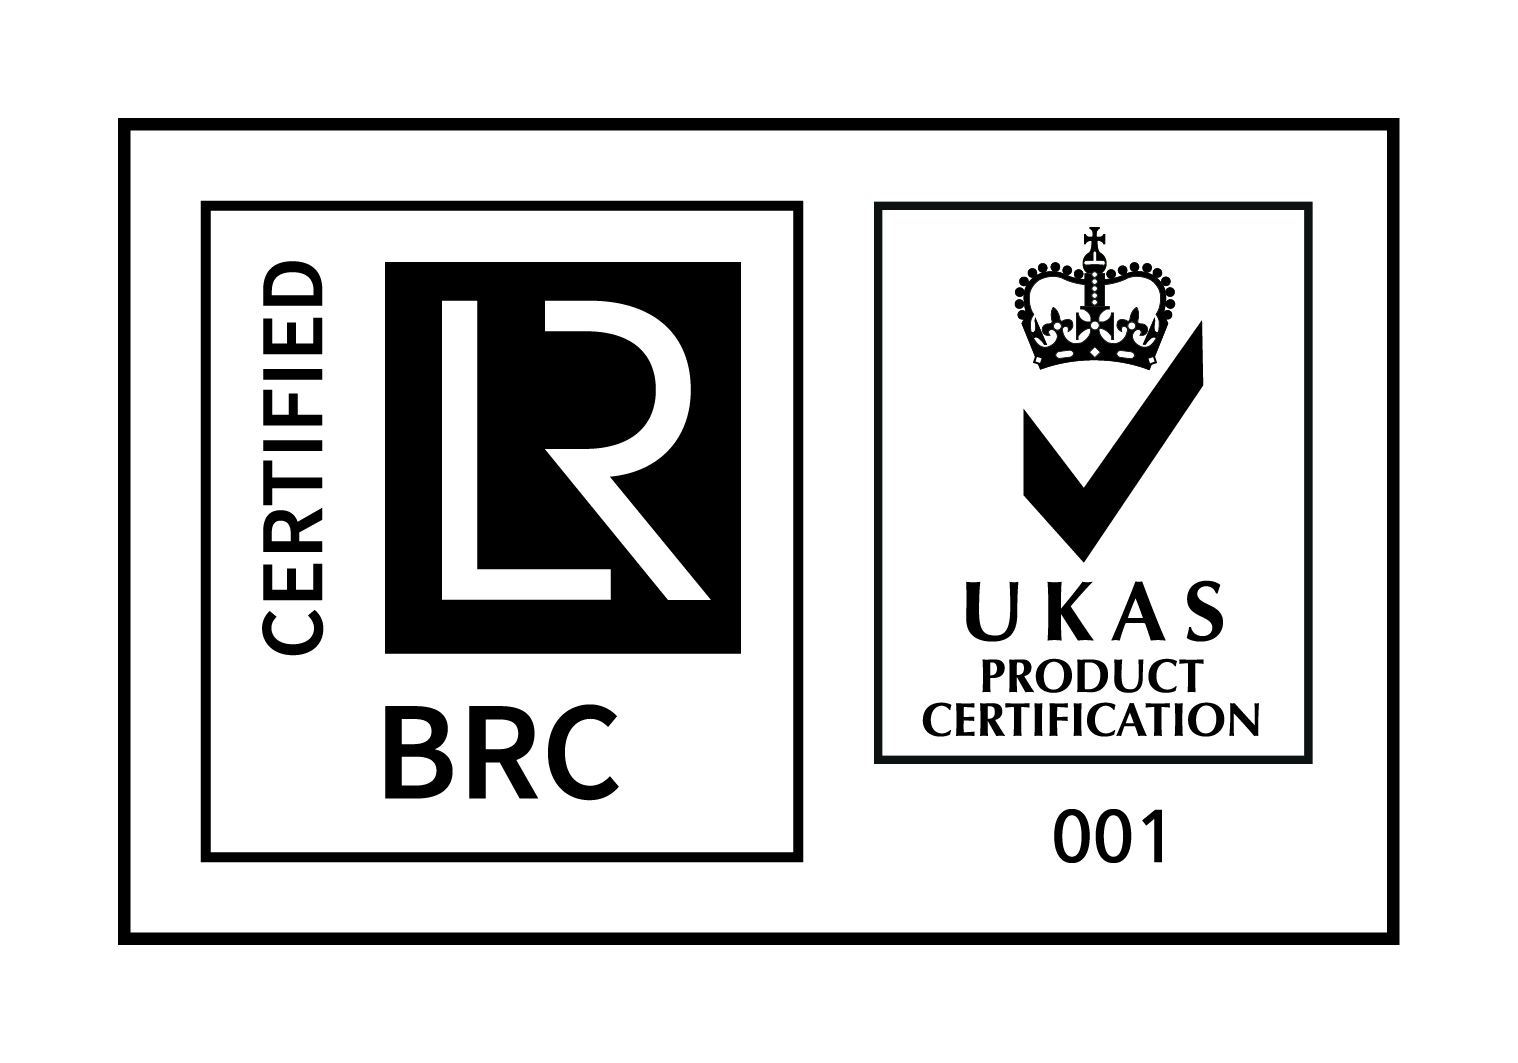 BRCGS Food-Safe Accreditation